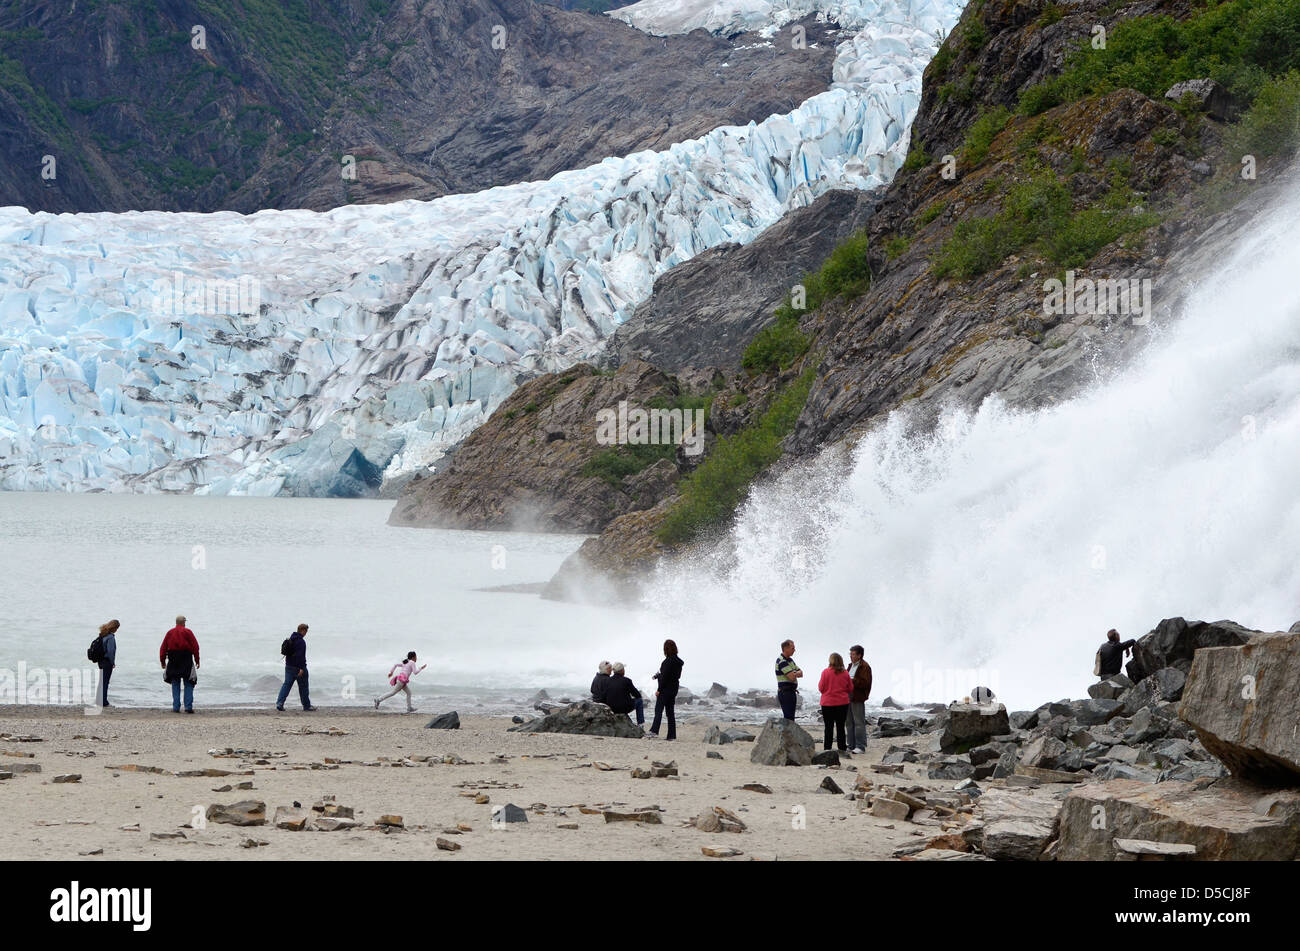 Tourists at Nugget Falls, Mendenhall Glacier Recreation Area, Alaska. - Stock Image